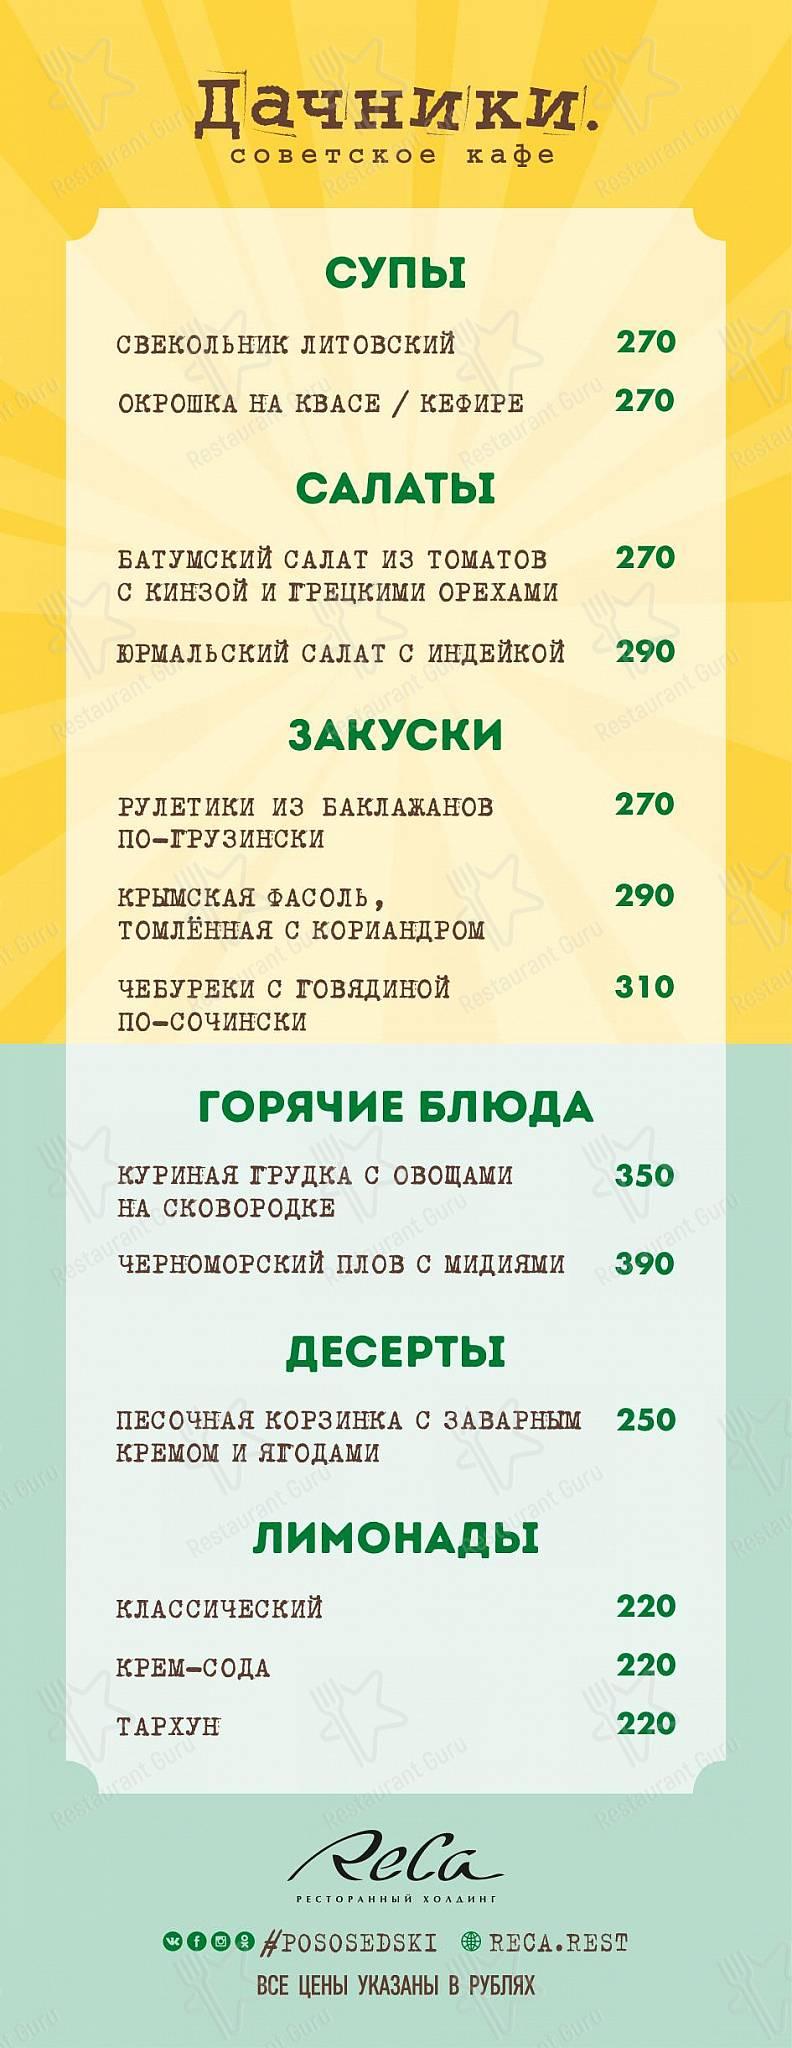 Меню Дачники - еда и напитки